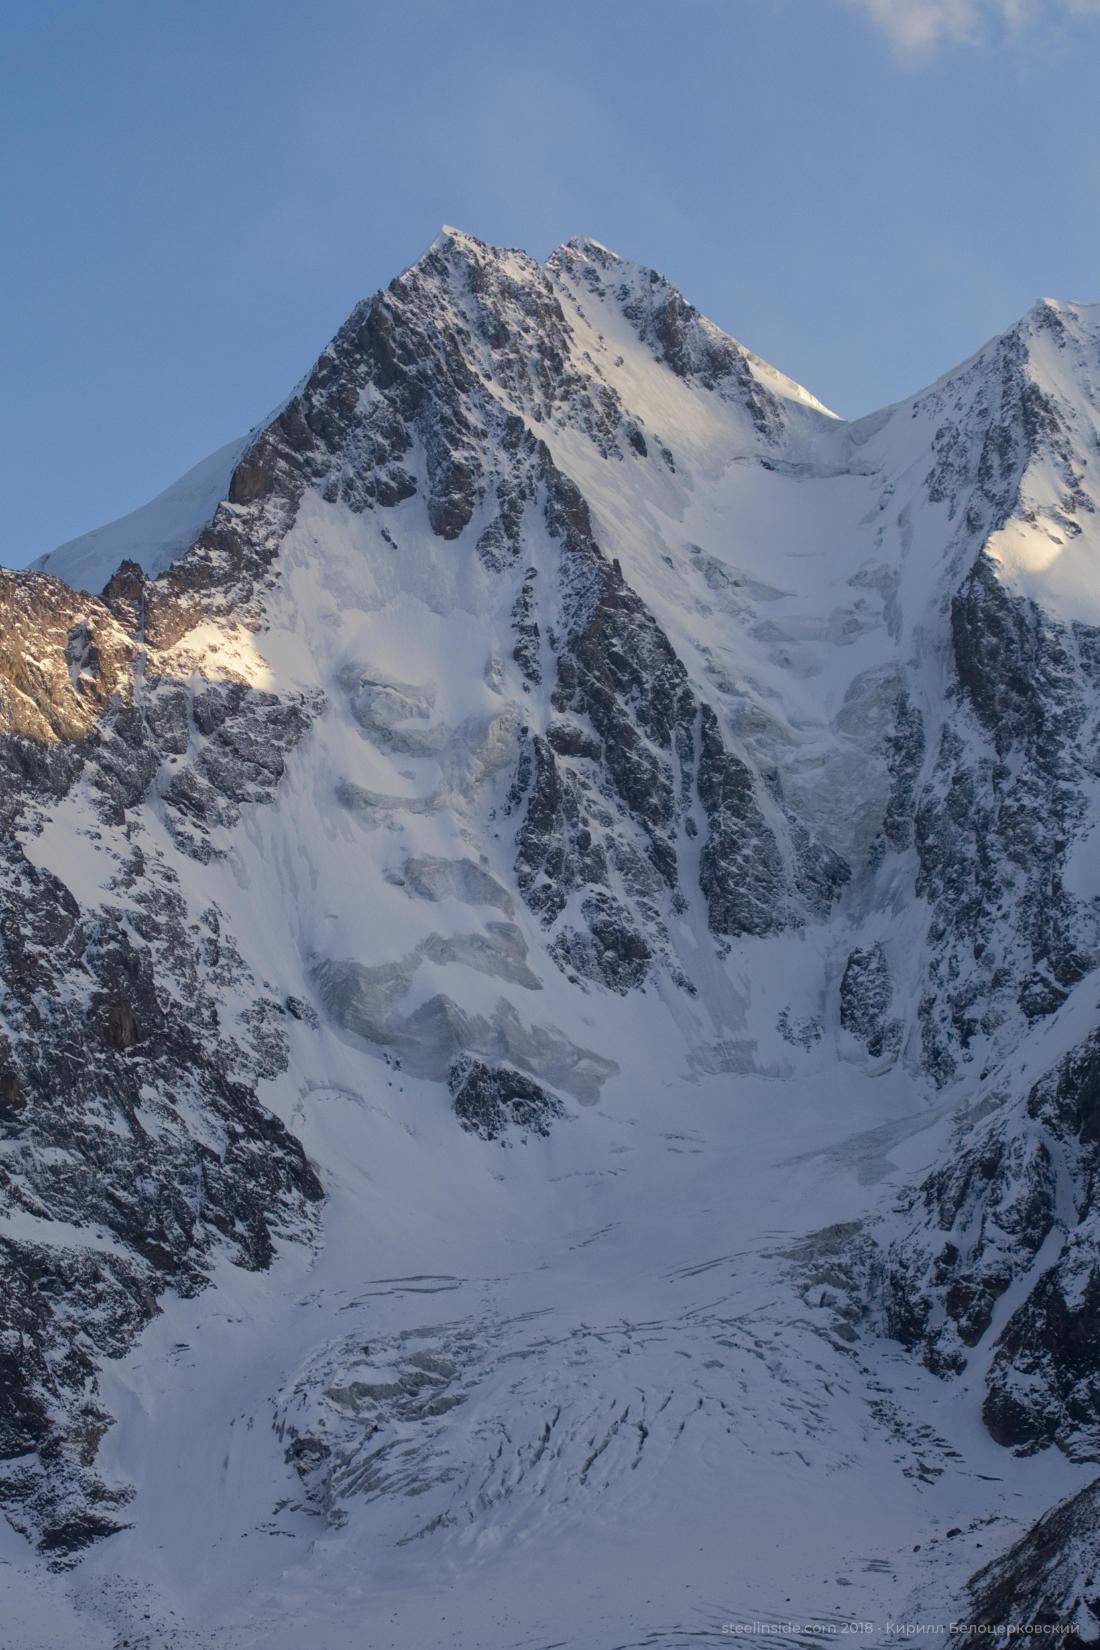 А слева и справа ледопады. Всё как надо.